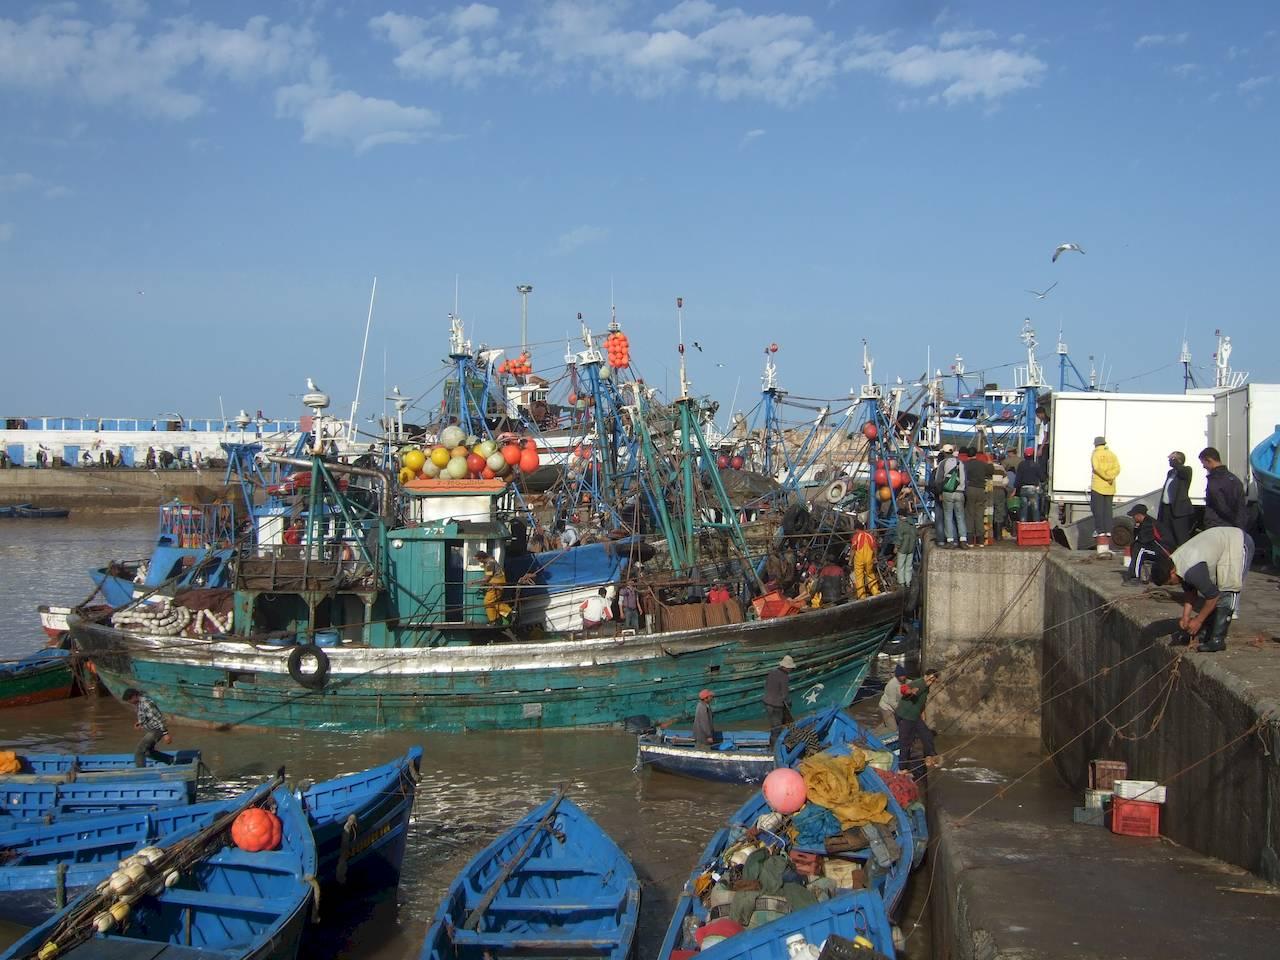 unloading trawlers to trucks